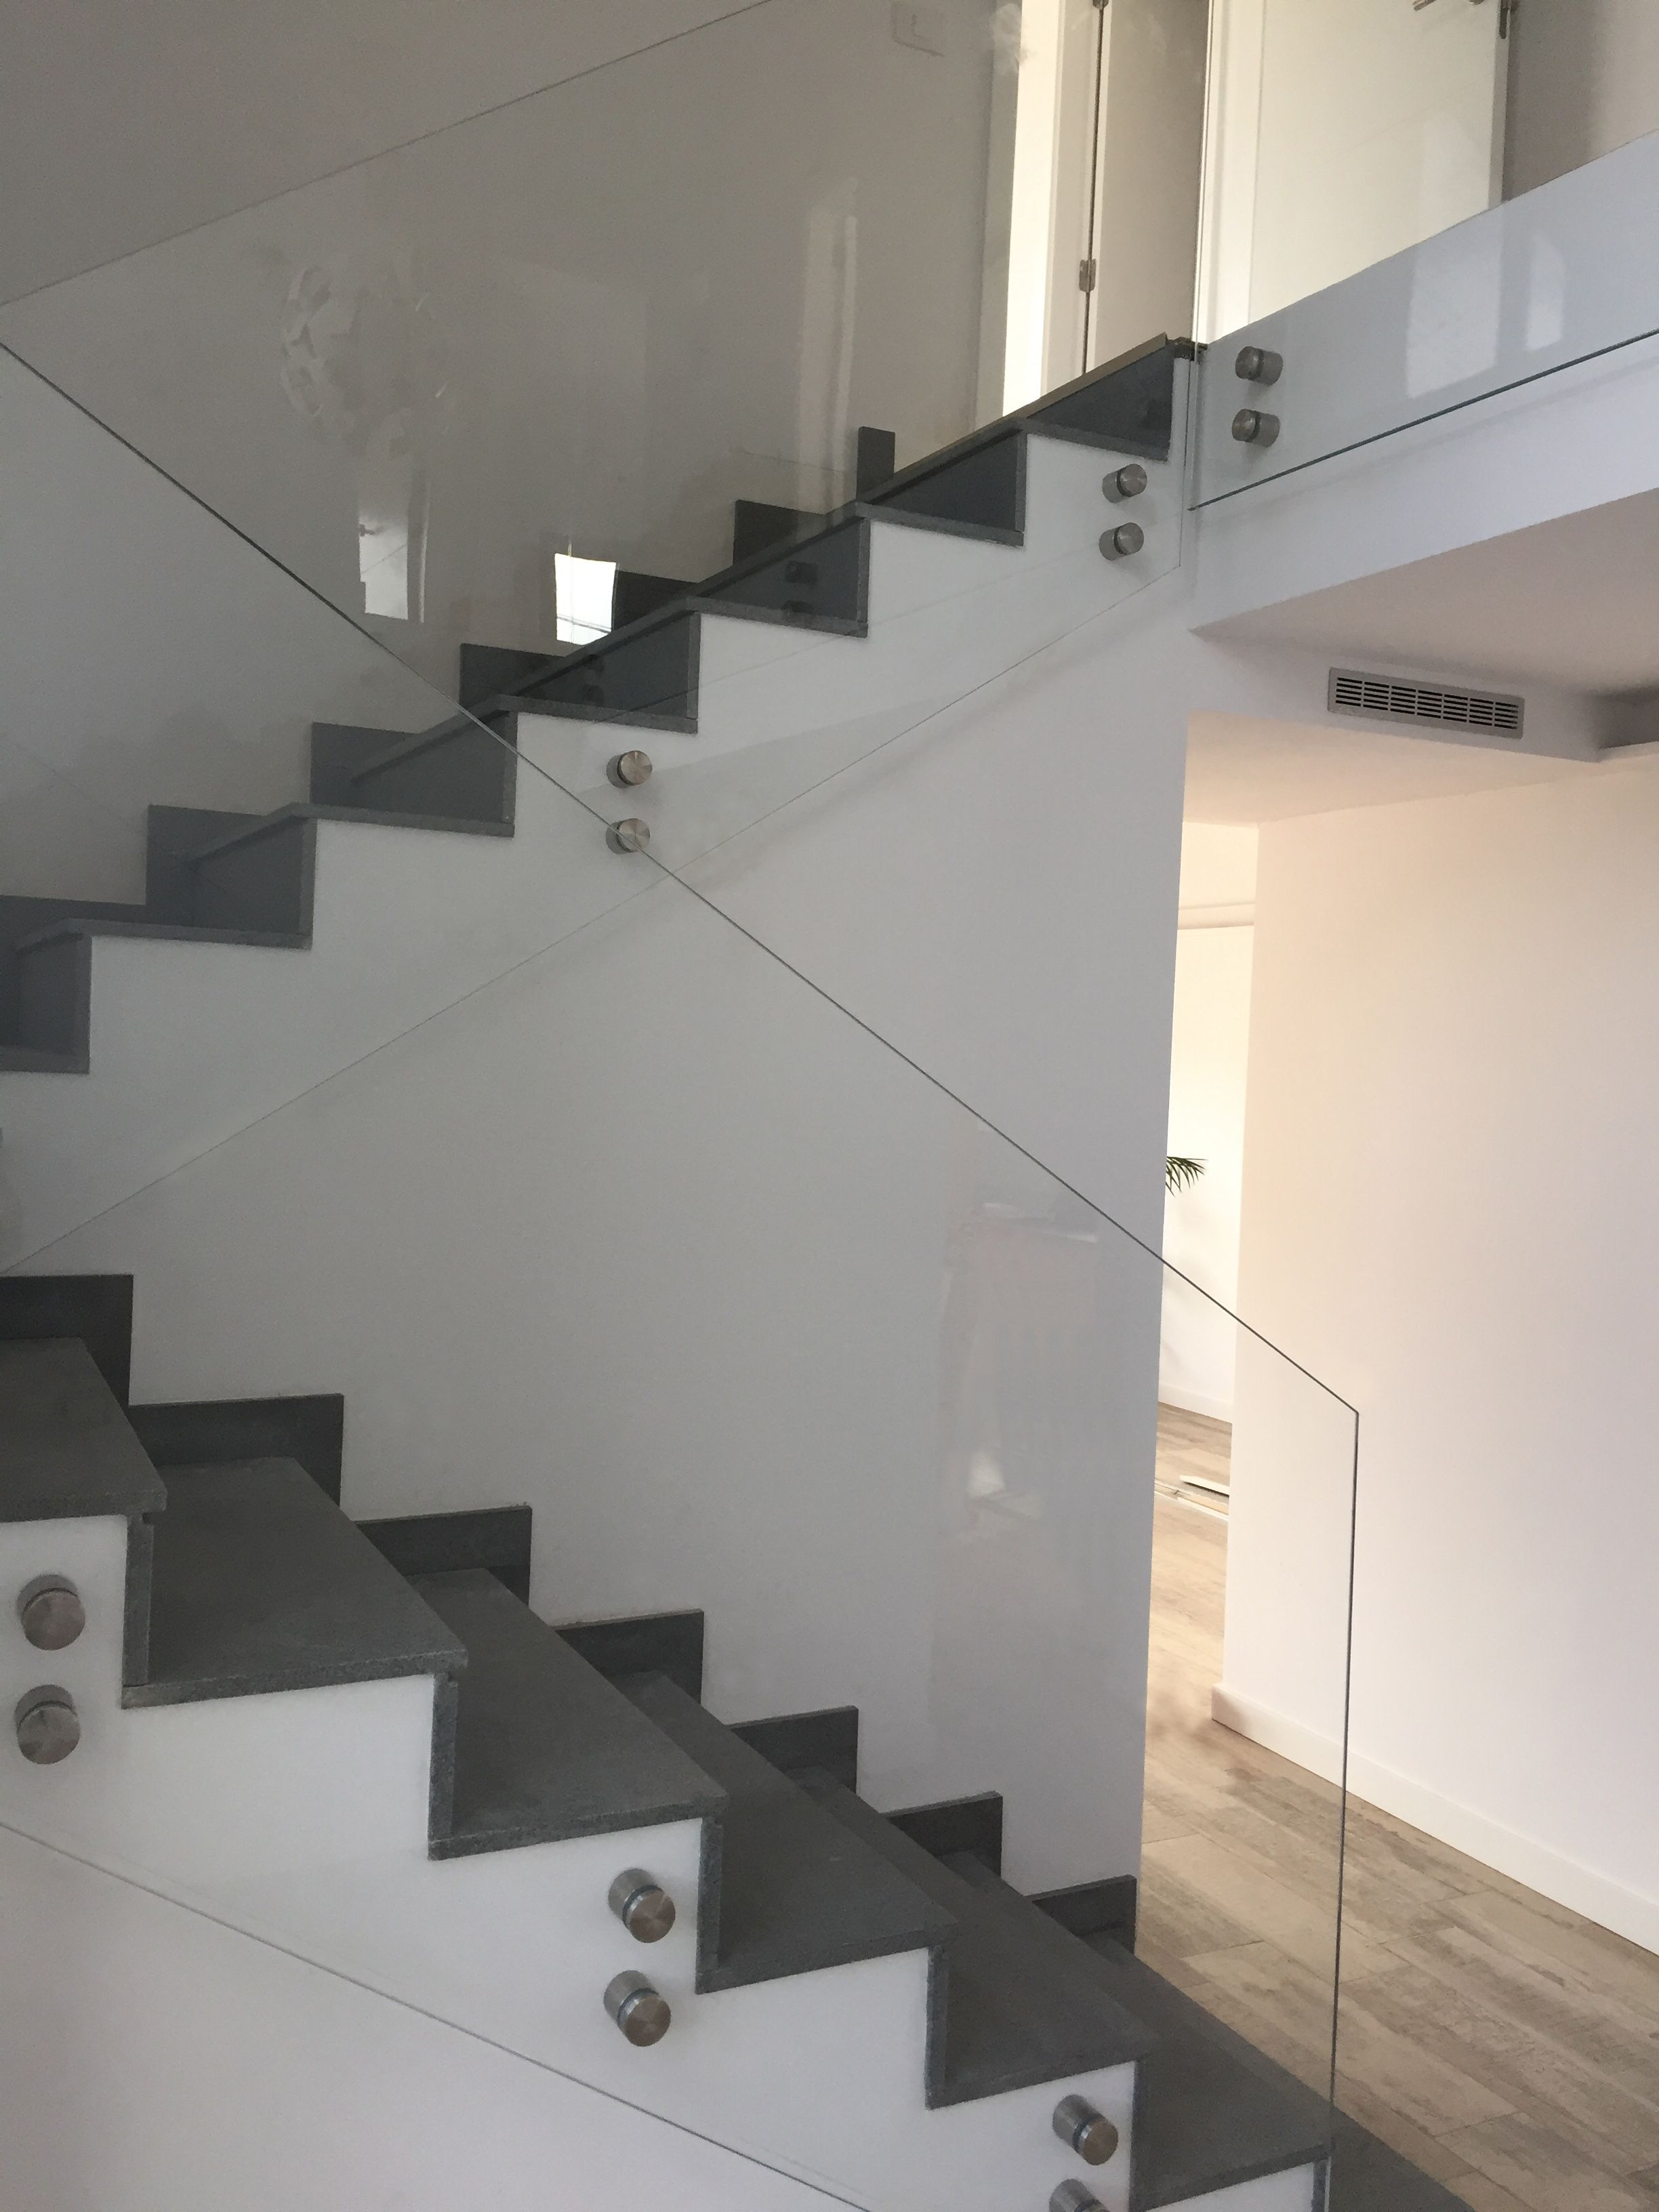 Pin de cristaler a cruz p rez en barandilla home decor - Escaleras de acero y cristal ...